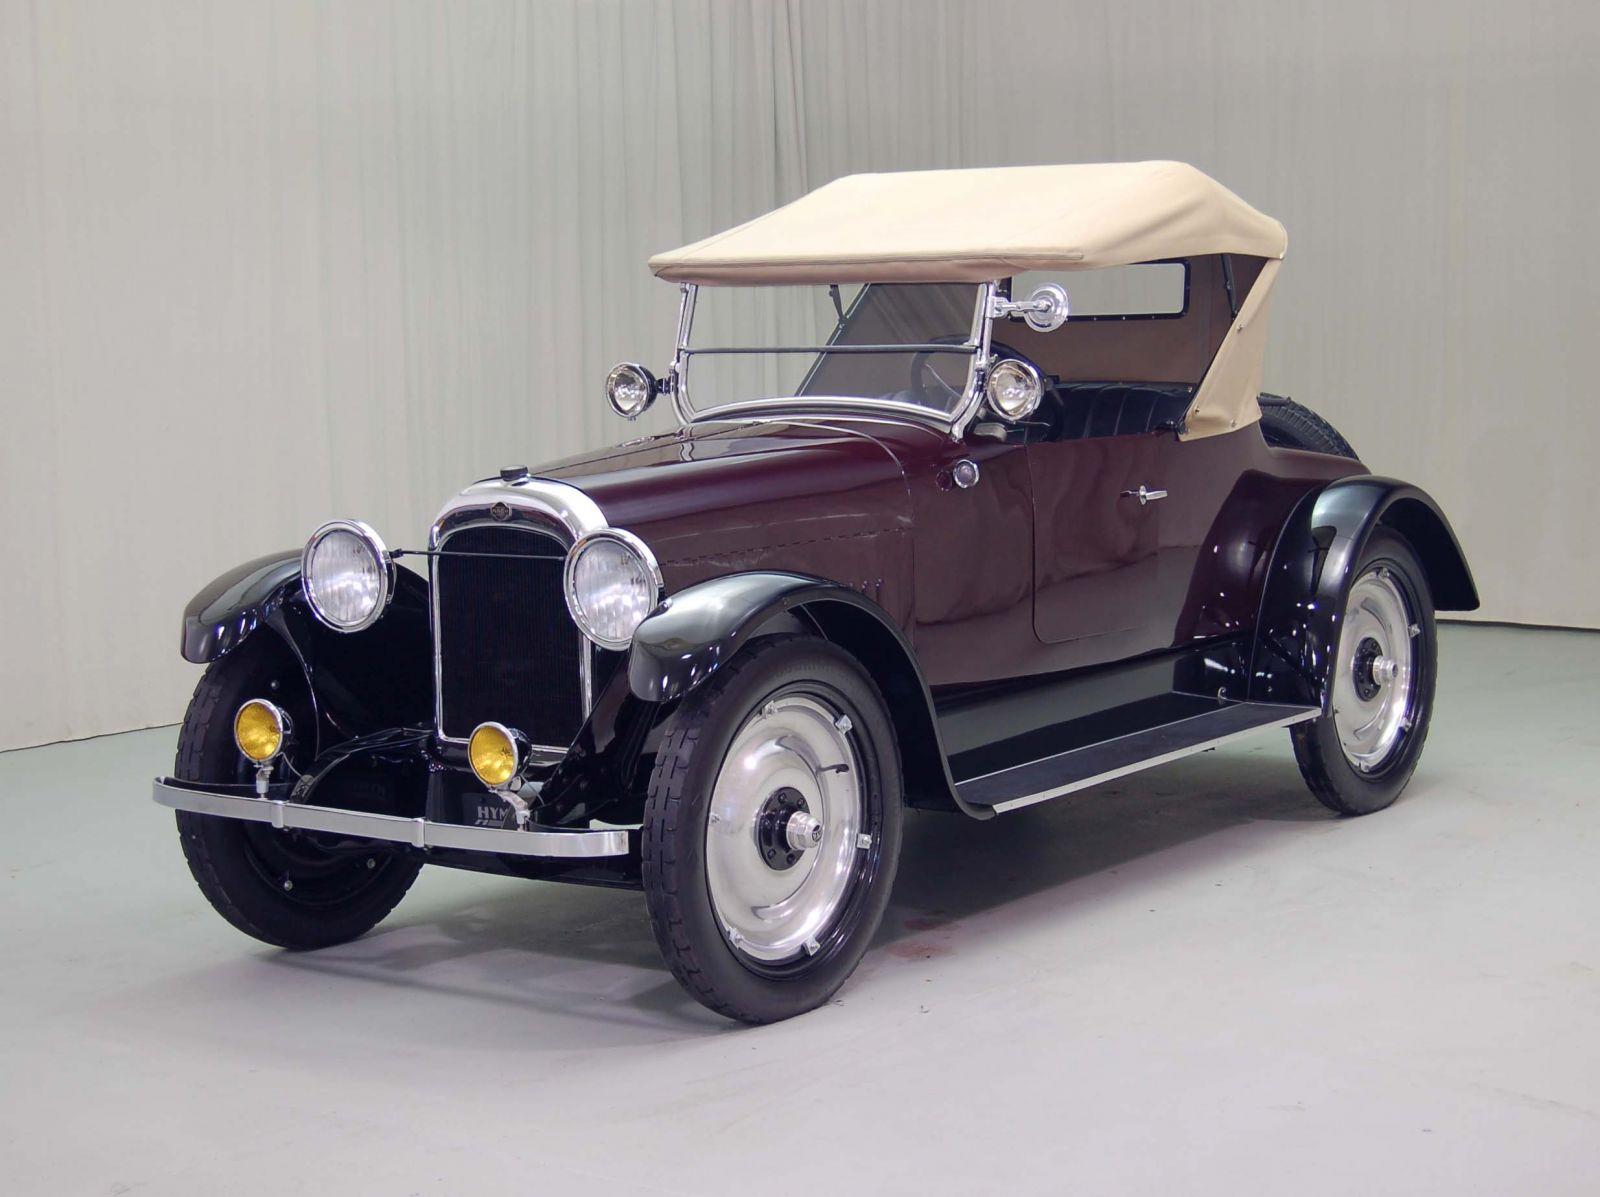 1922 Nash Digney Classic Car For Sale | Buy 1922 Nash Digney at Hyman LTD